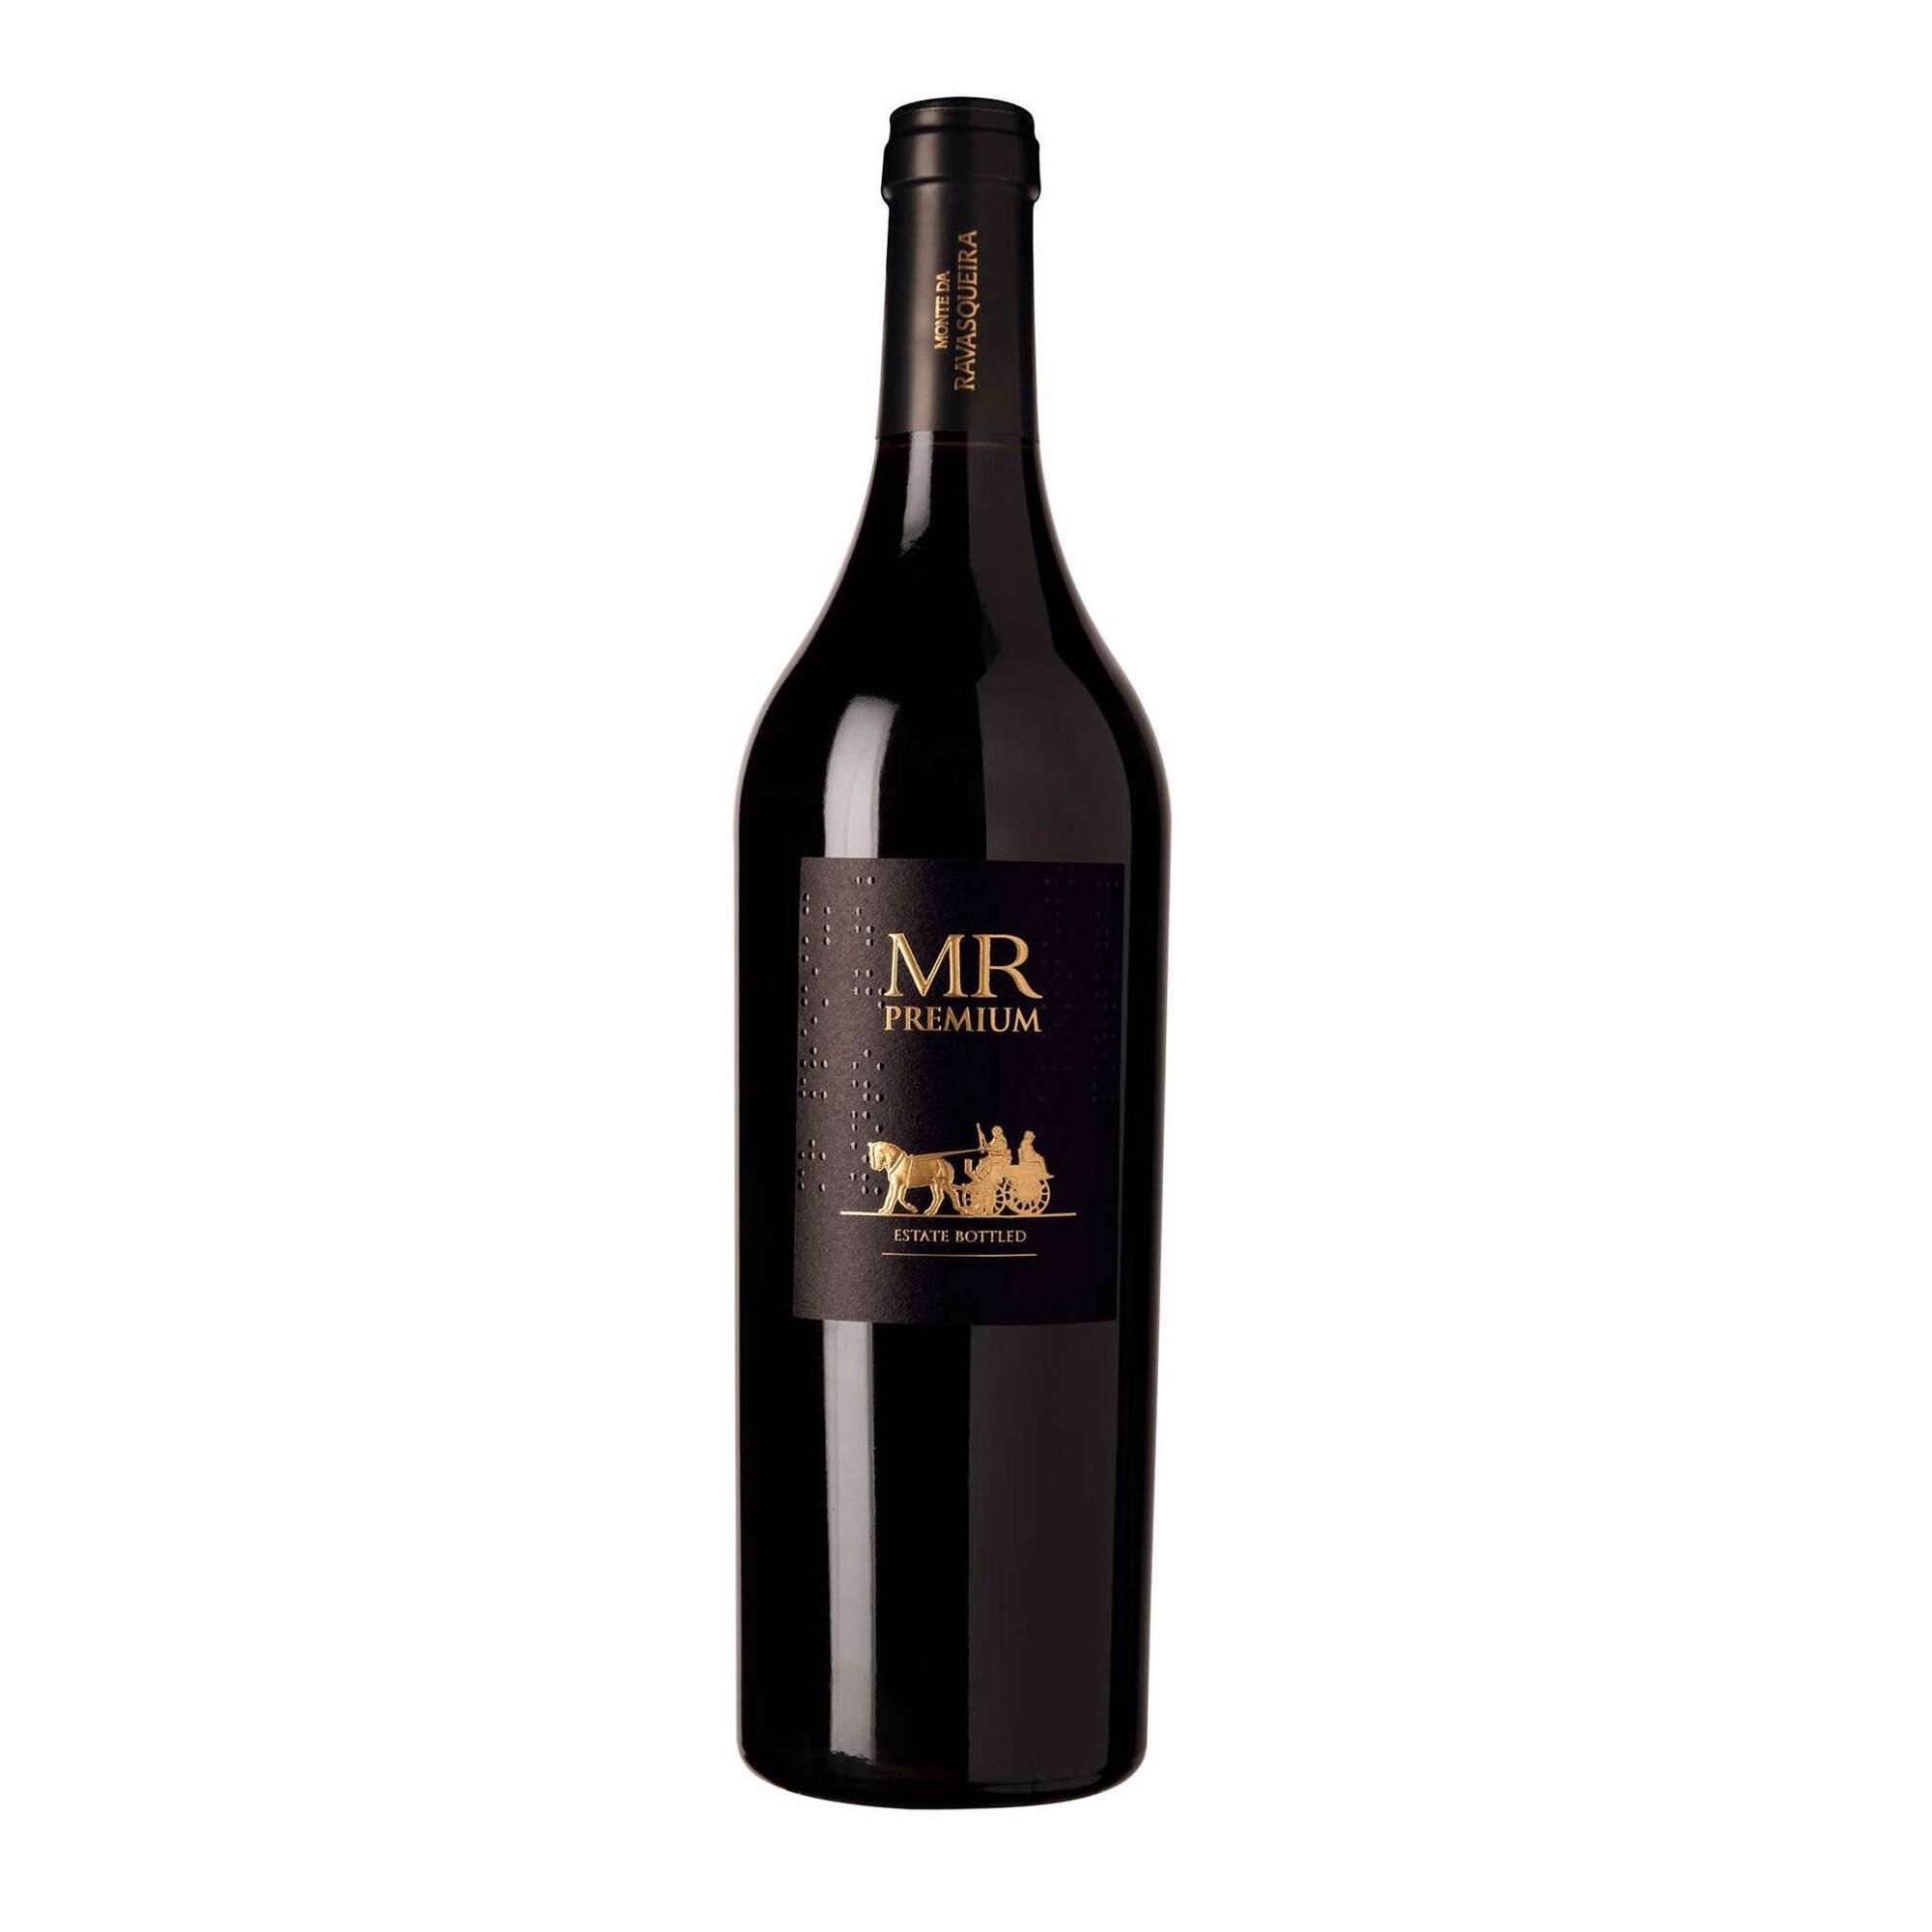 Mr Premium Regional Alentejano Vinho Tinto